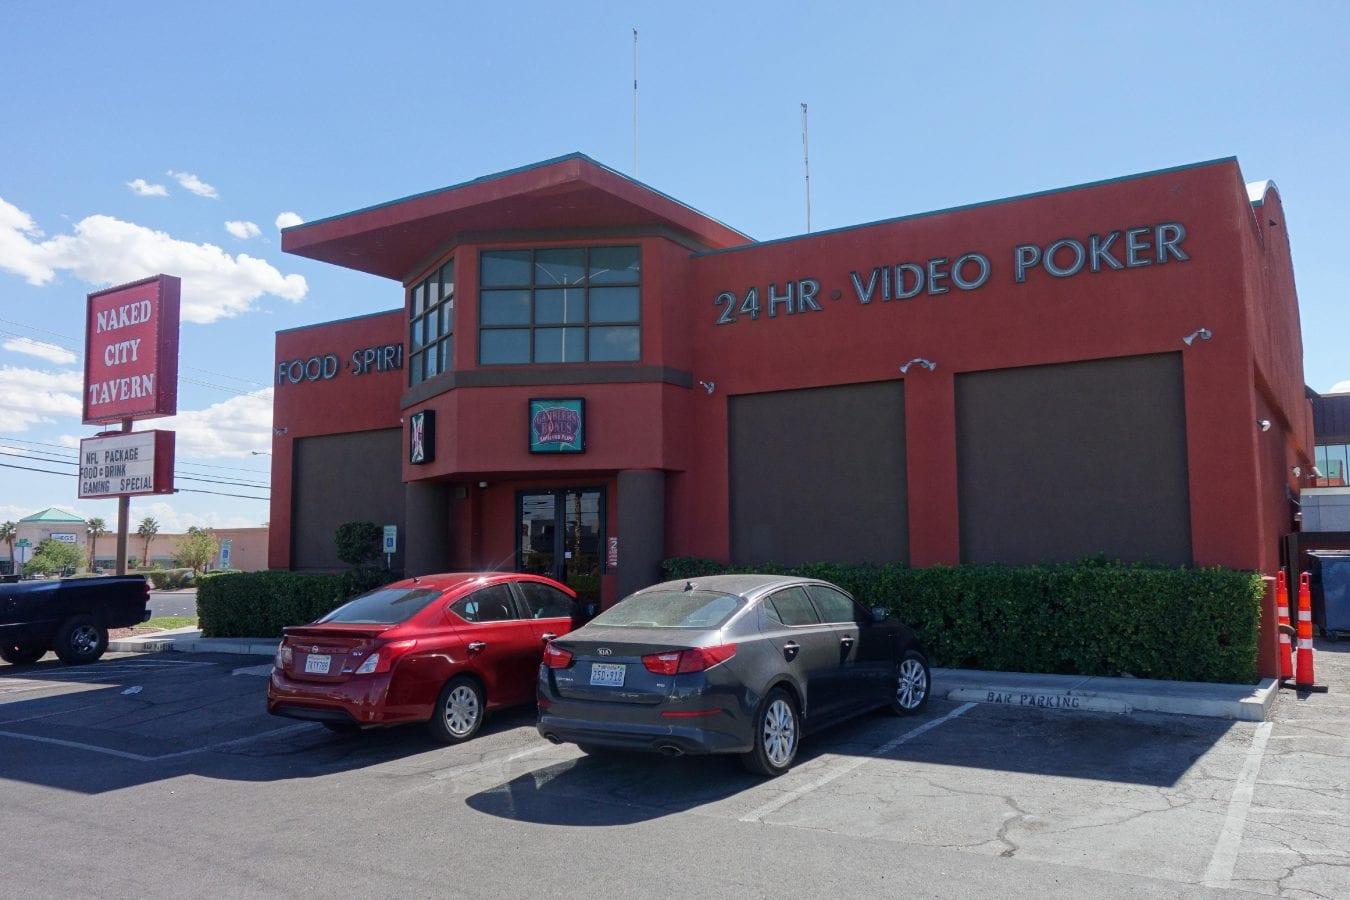 Naked City Tavern: A Las Vegas, NV Restaurant - Thrillist